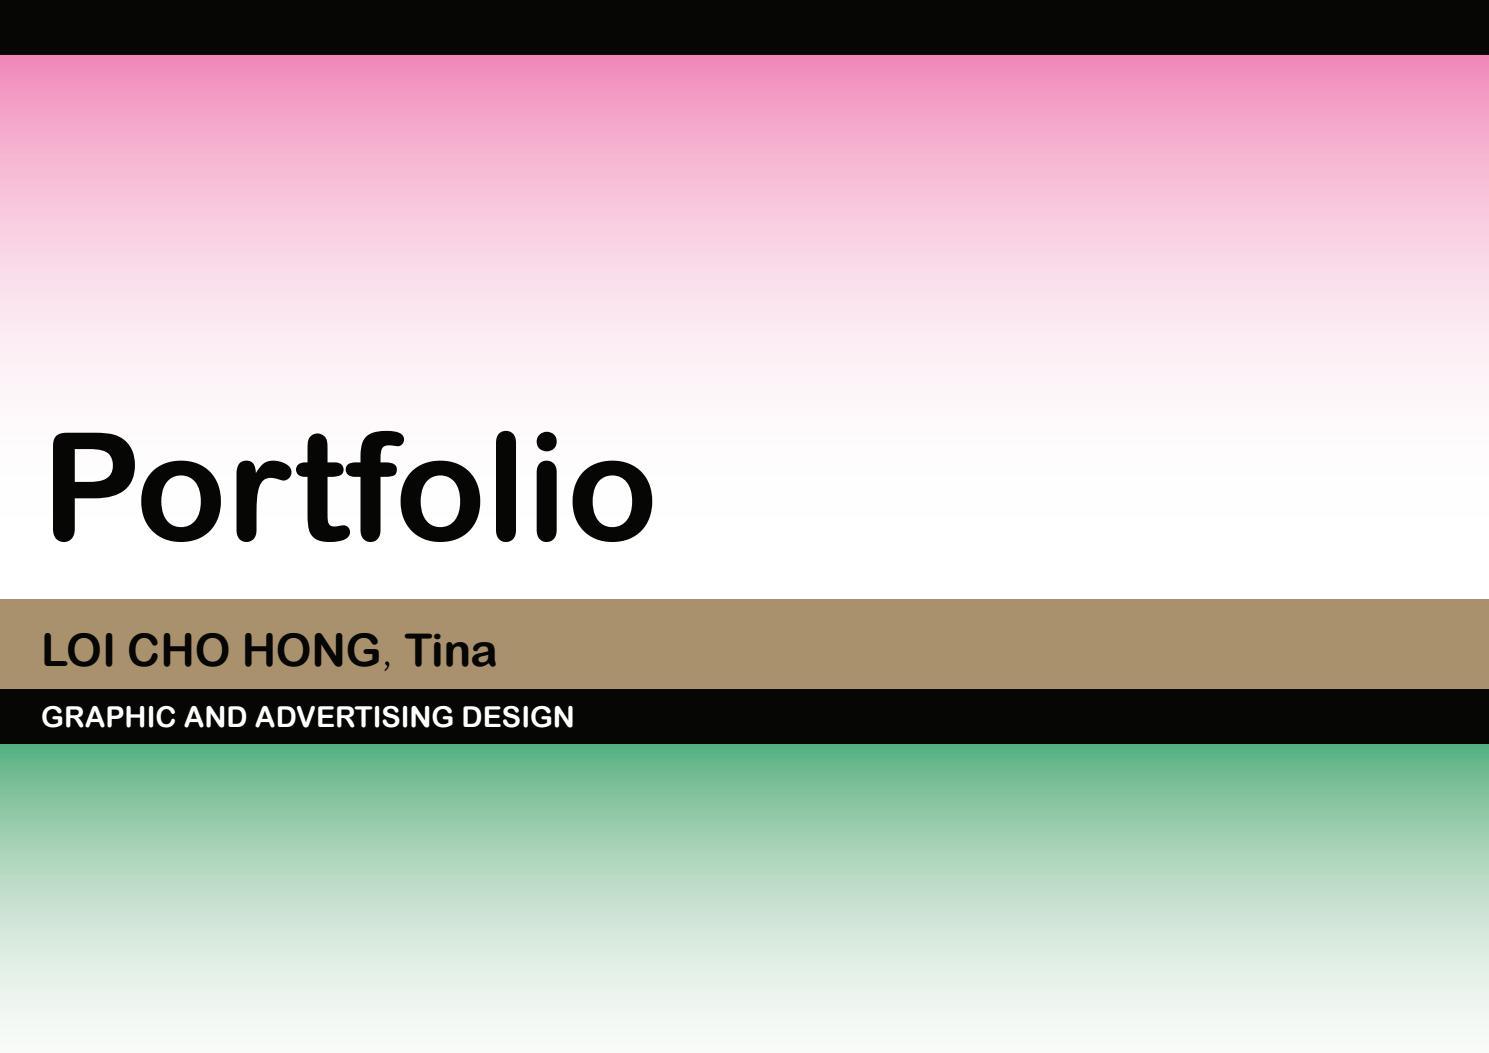 Tina's Protfolio 2019 by Loi Cho Hong - Issuu